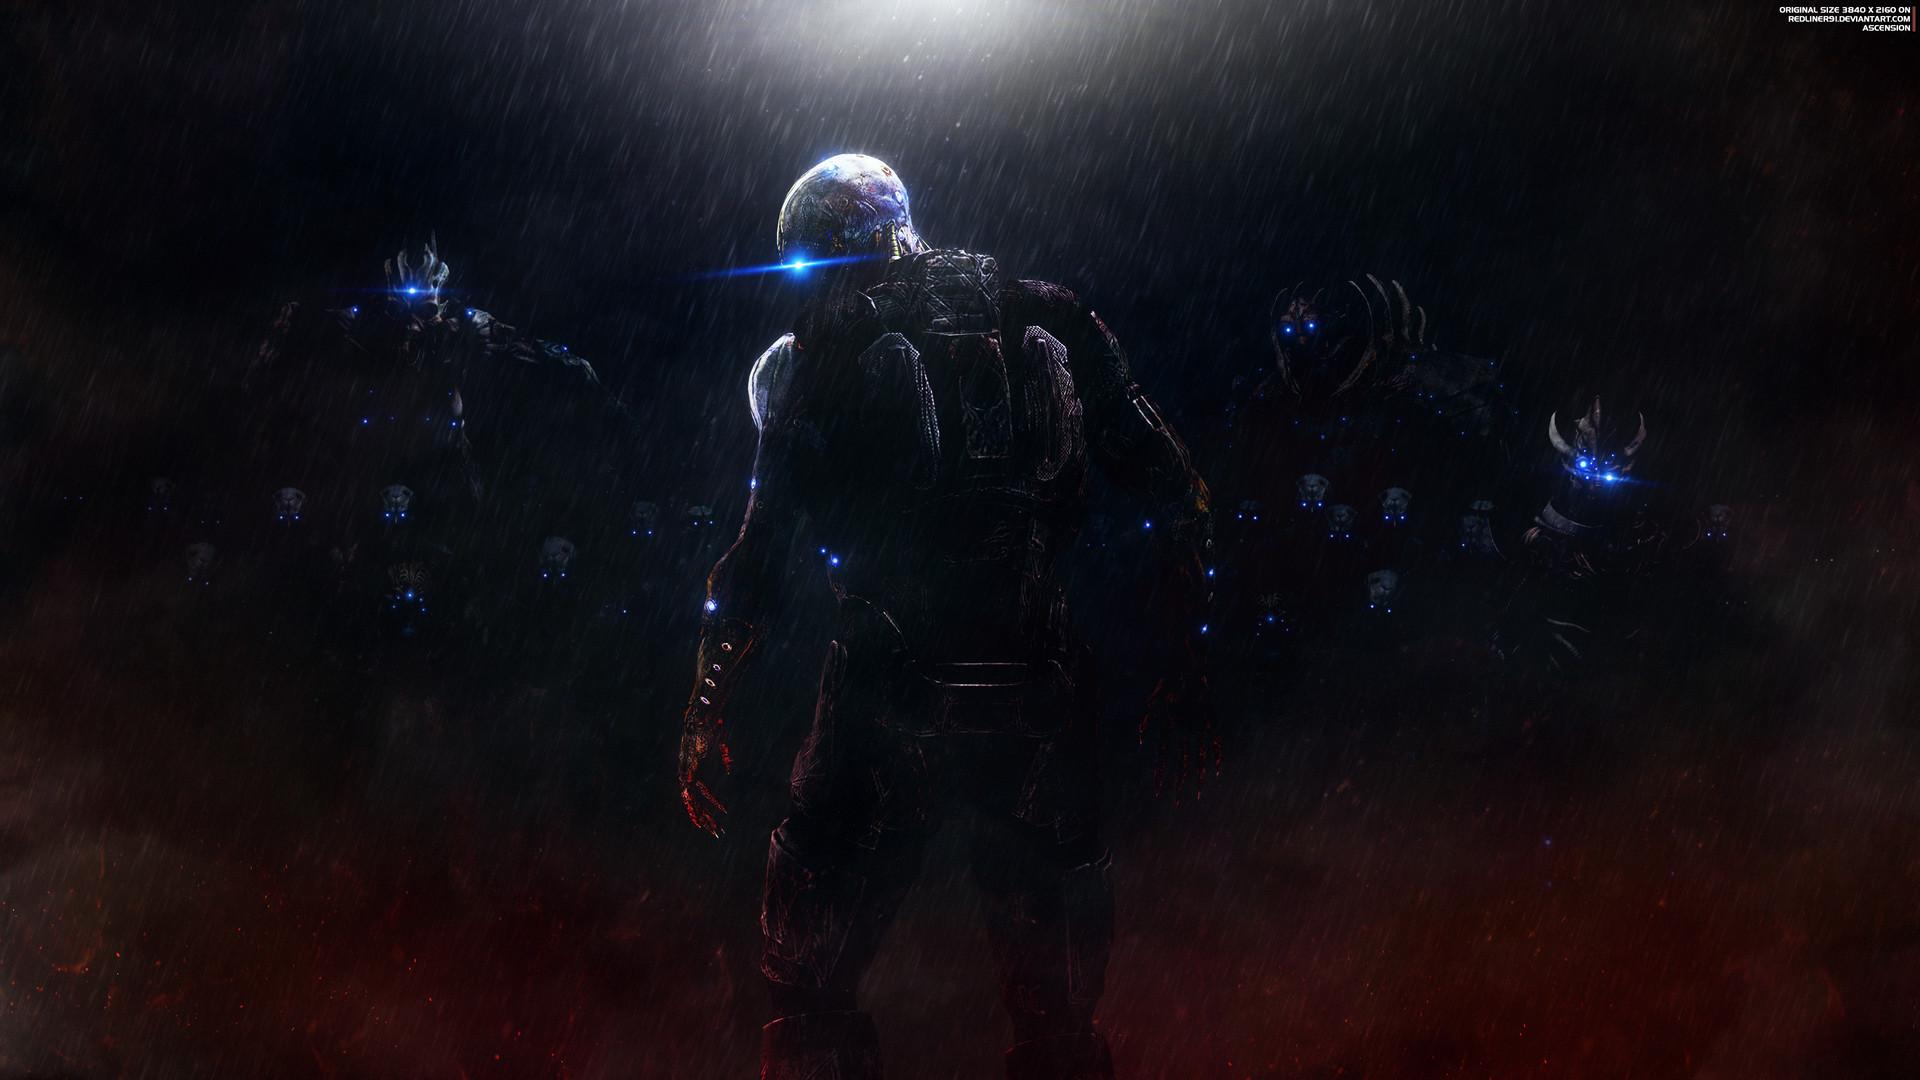 Artstation Ascension Mass Effect Trilogy Wallpaper 4k